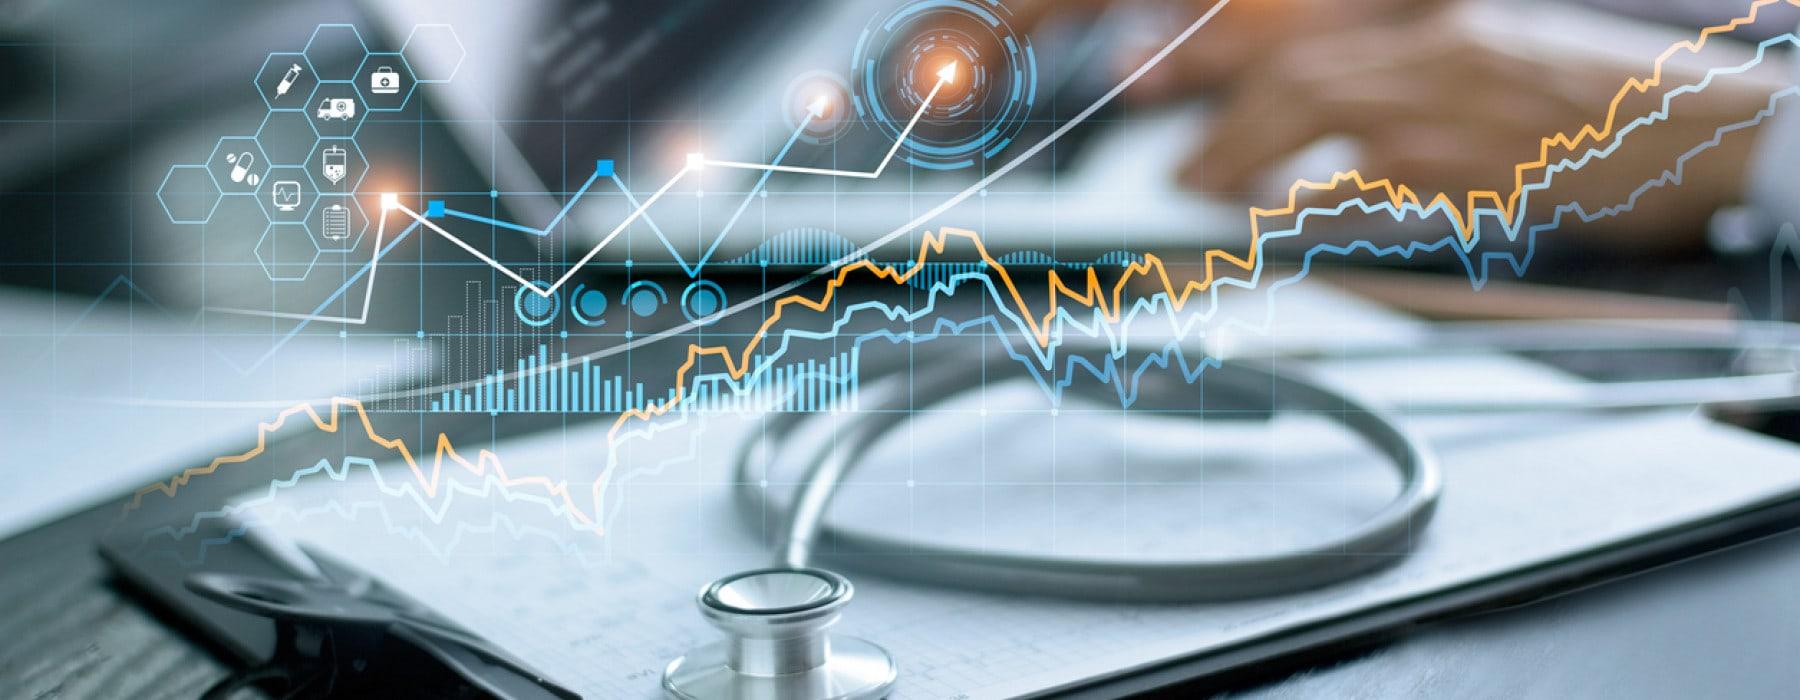 EHR PROS 2 - stockfresh 7904449 doctor-using-tablet-in-hospital sizeXS-min